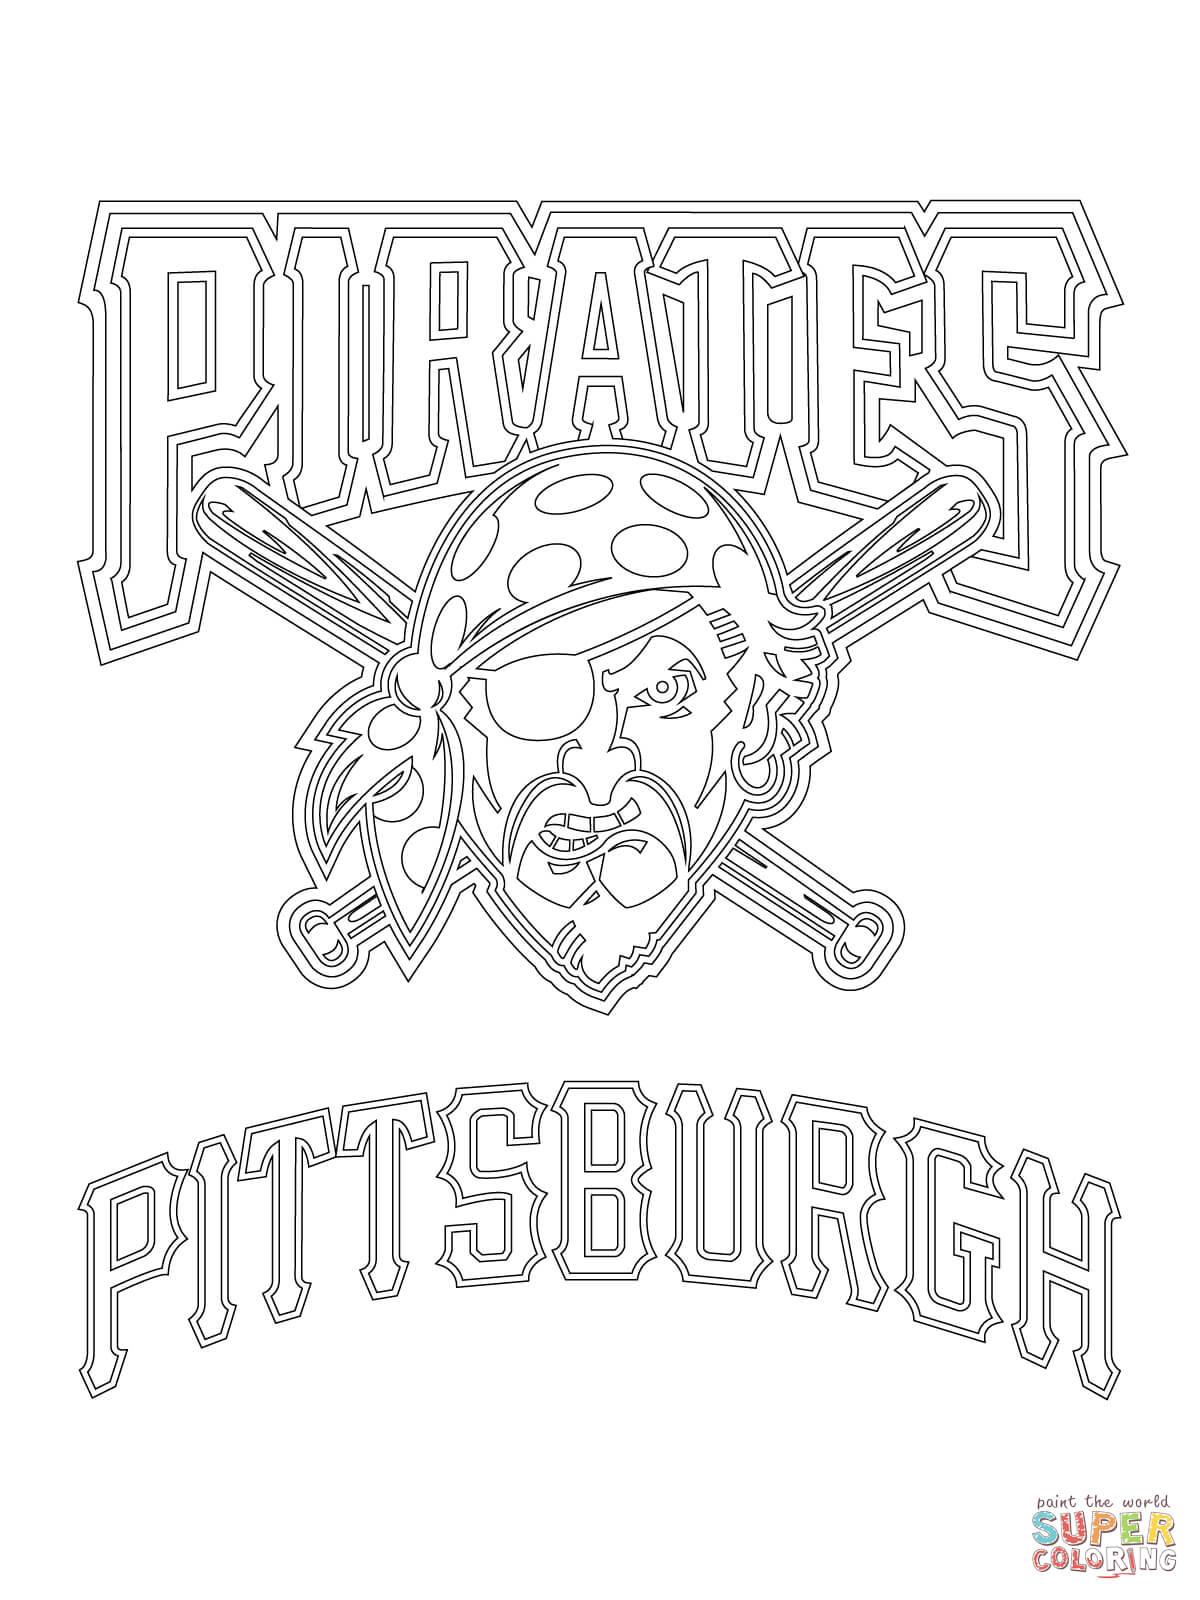 Pittsburgh Pirates Logo Coloring Page